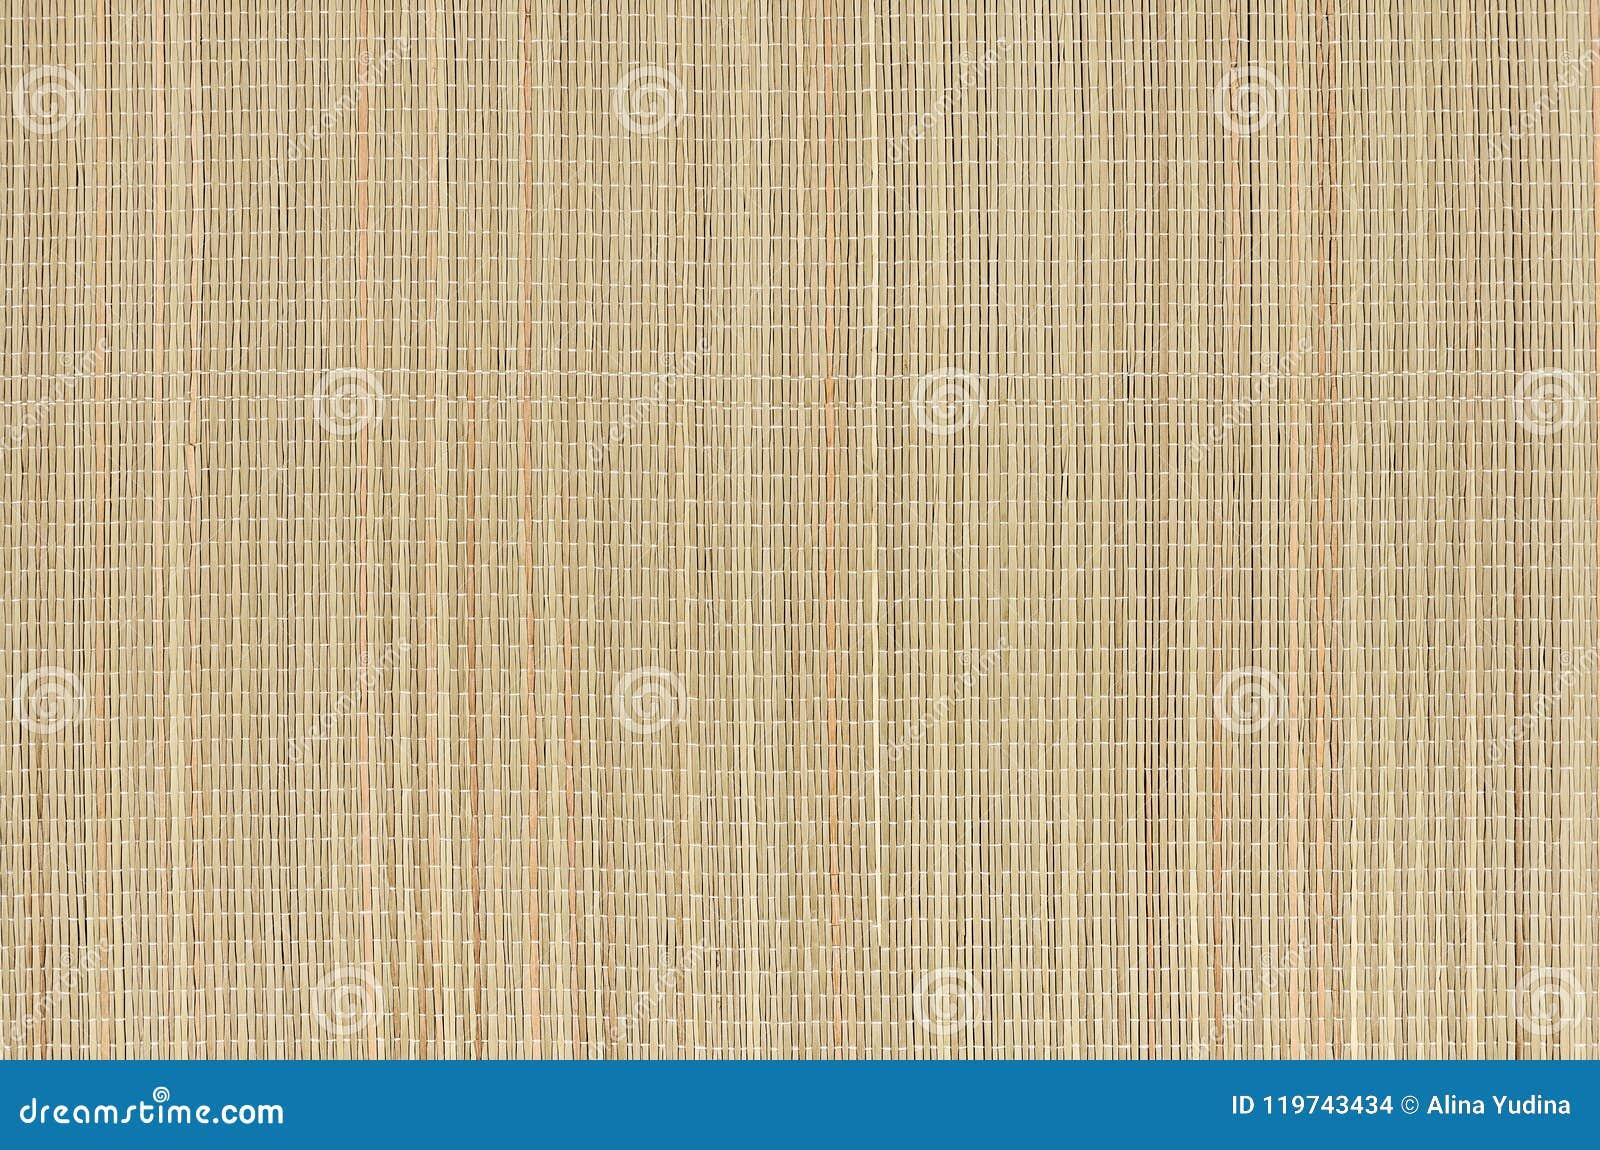 Stuoia naturale beige di erba di vimini asciutta come struttura, fondo